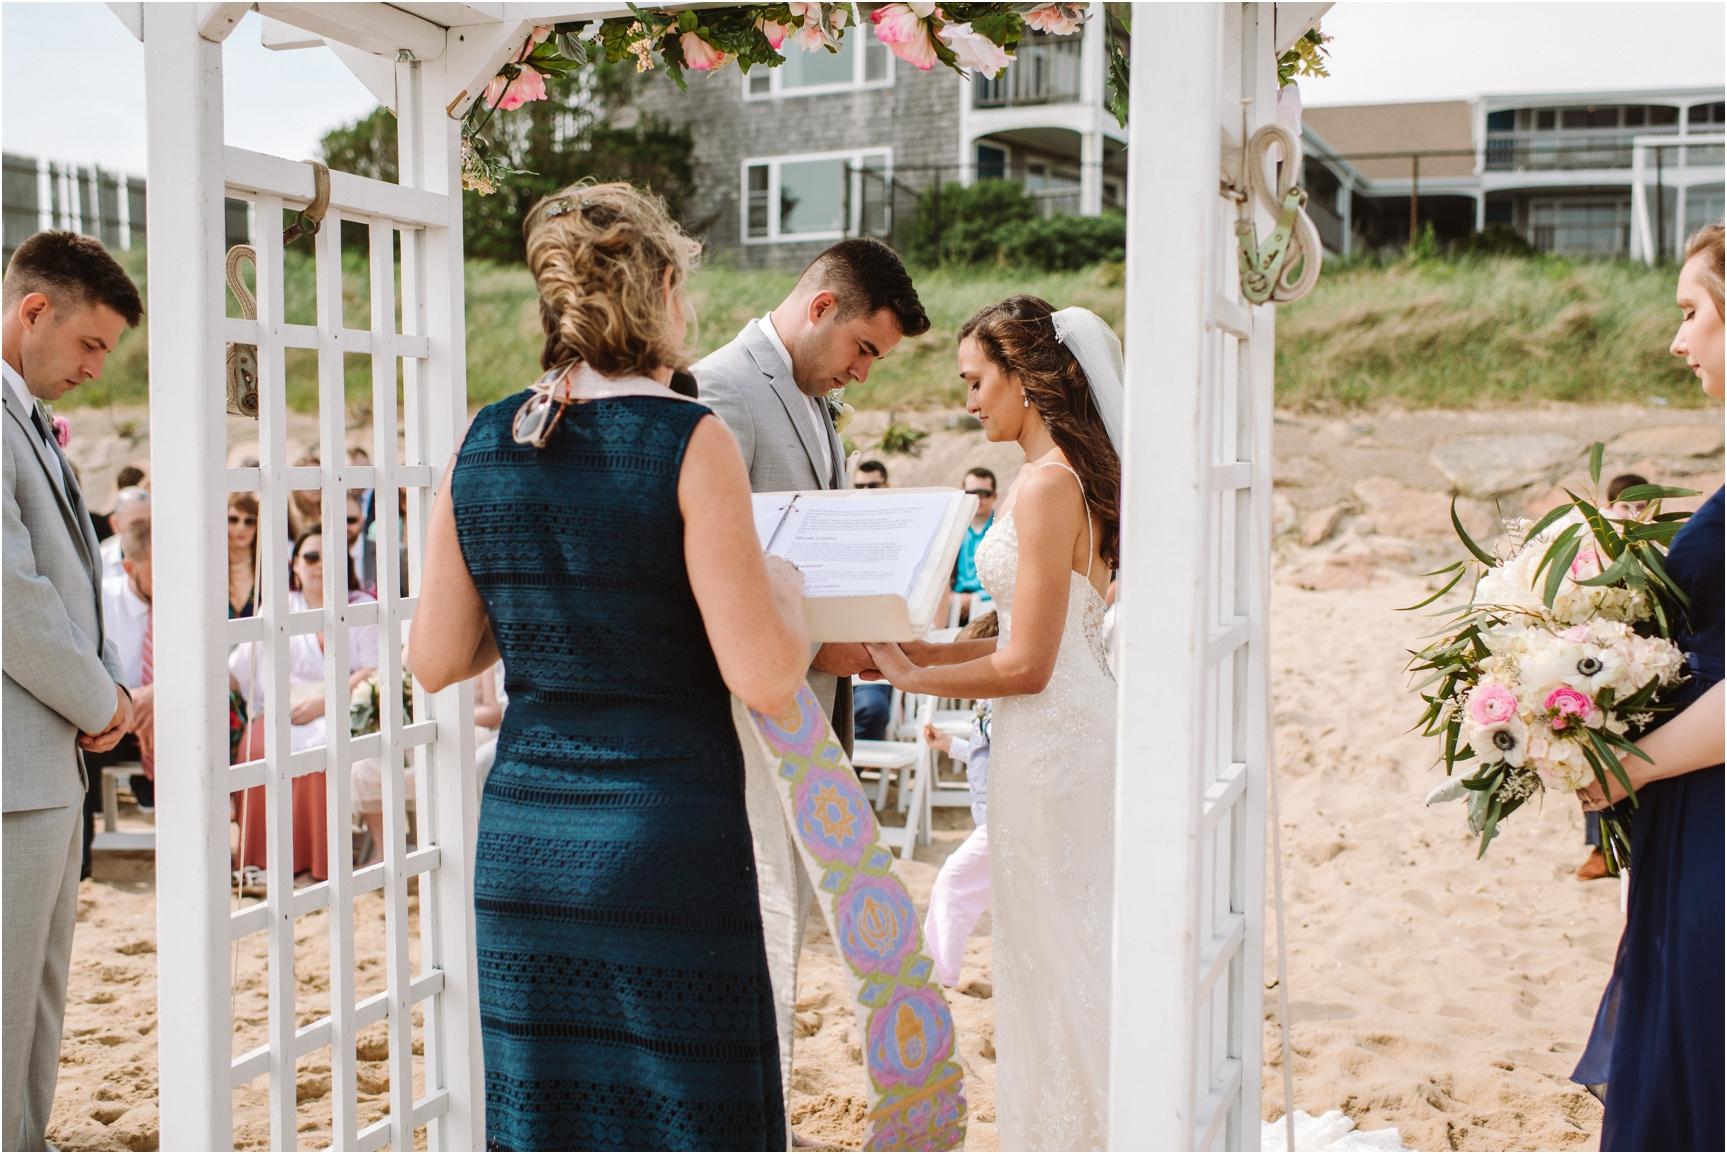 Sarah & Sam Pelham House Cape Cod Wedding Photographer-96.jpg